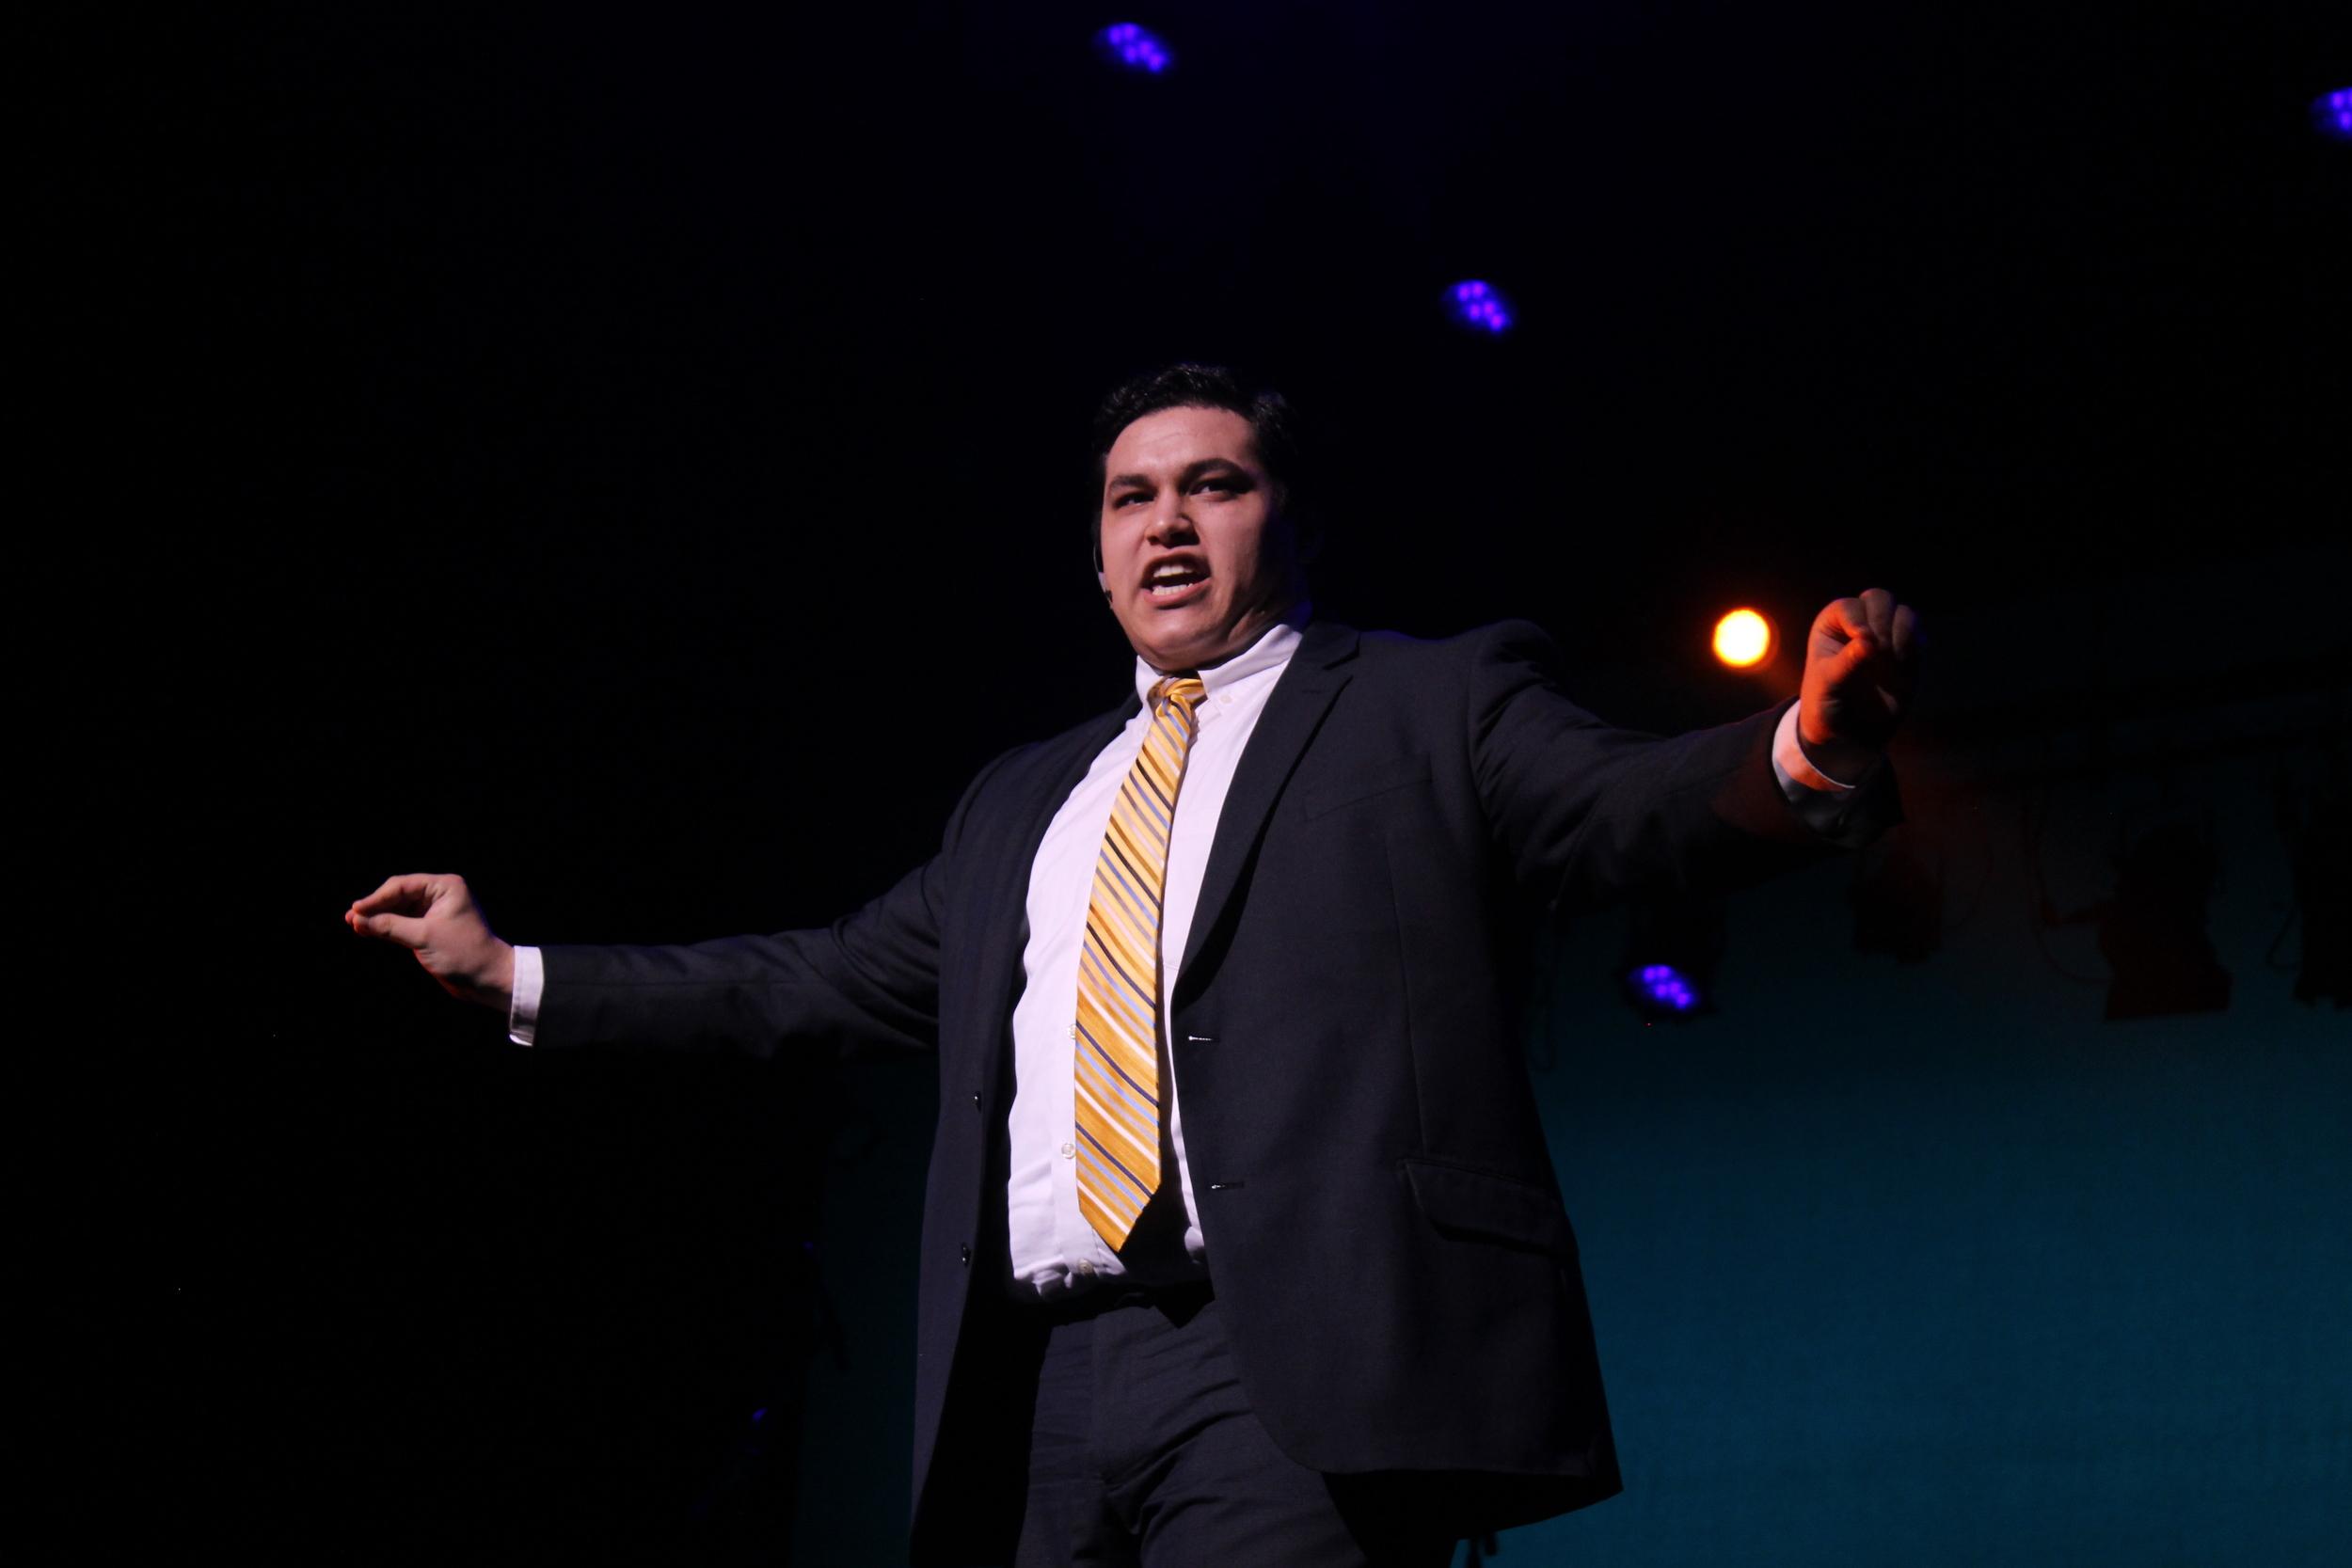 Winner Isaac Lopez's performance